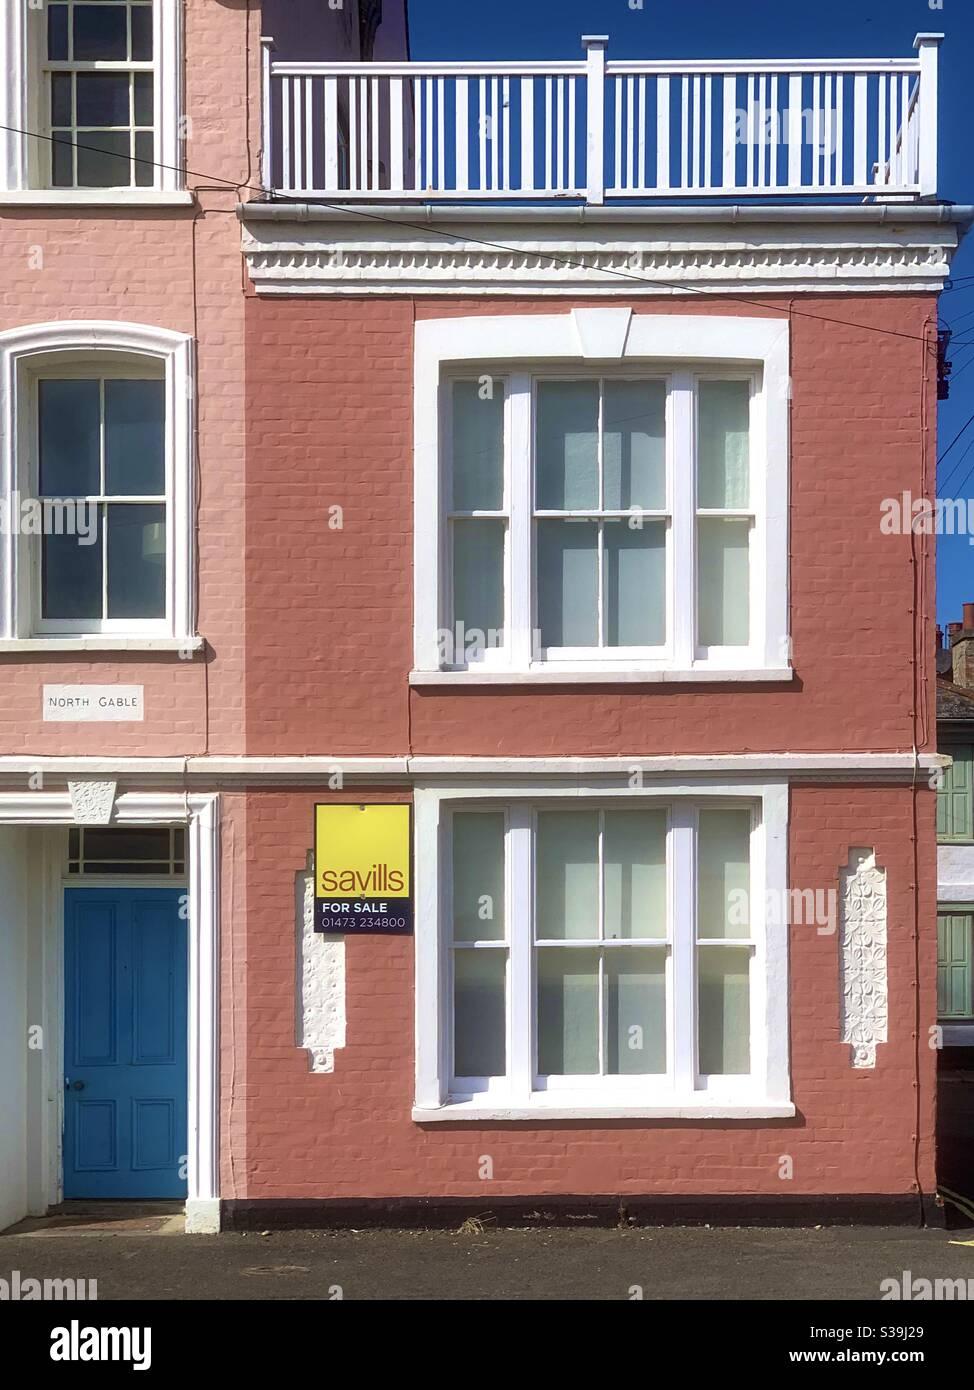 Aldeburgh, Suffolk, UK - 9 September 2020: Flinders Cottage on the seafront up for sale. Stock Photo